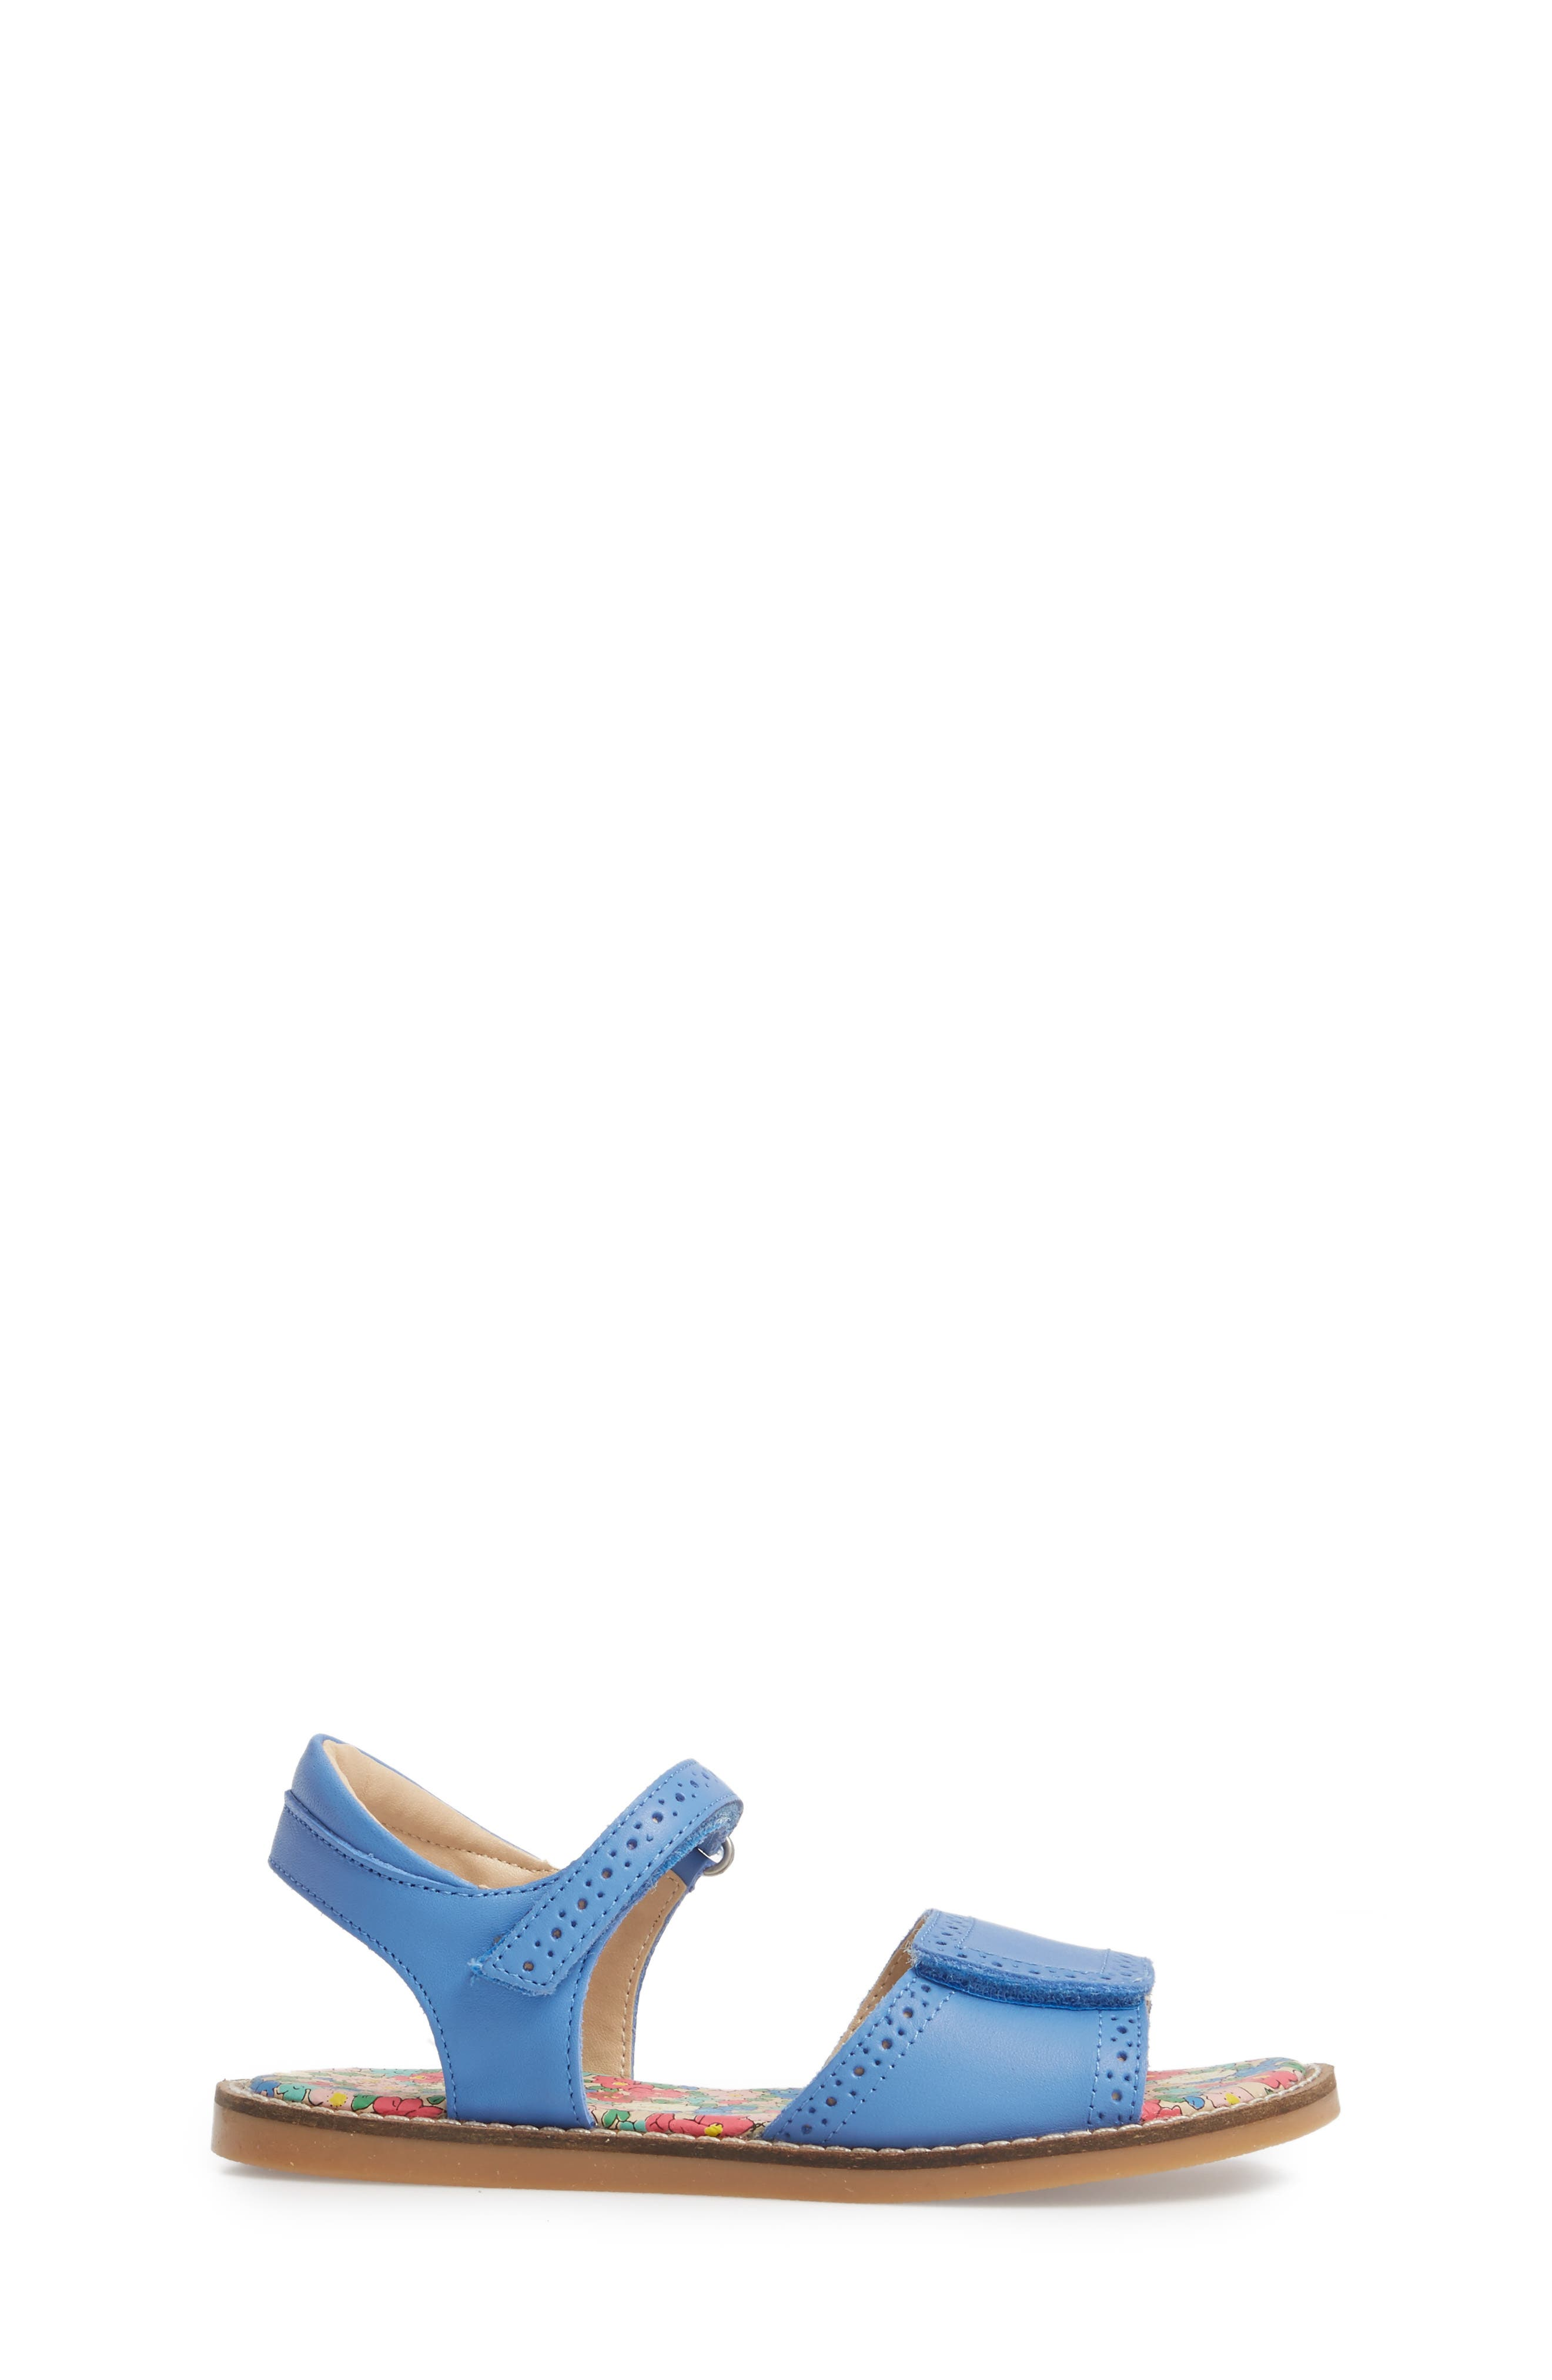 Adjustable Quarter Strap Sandal,                             Alternate thumbnail 3, color,                             424